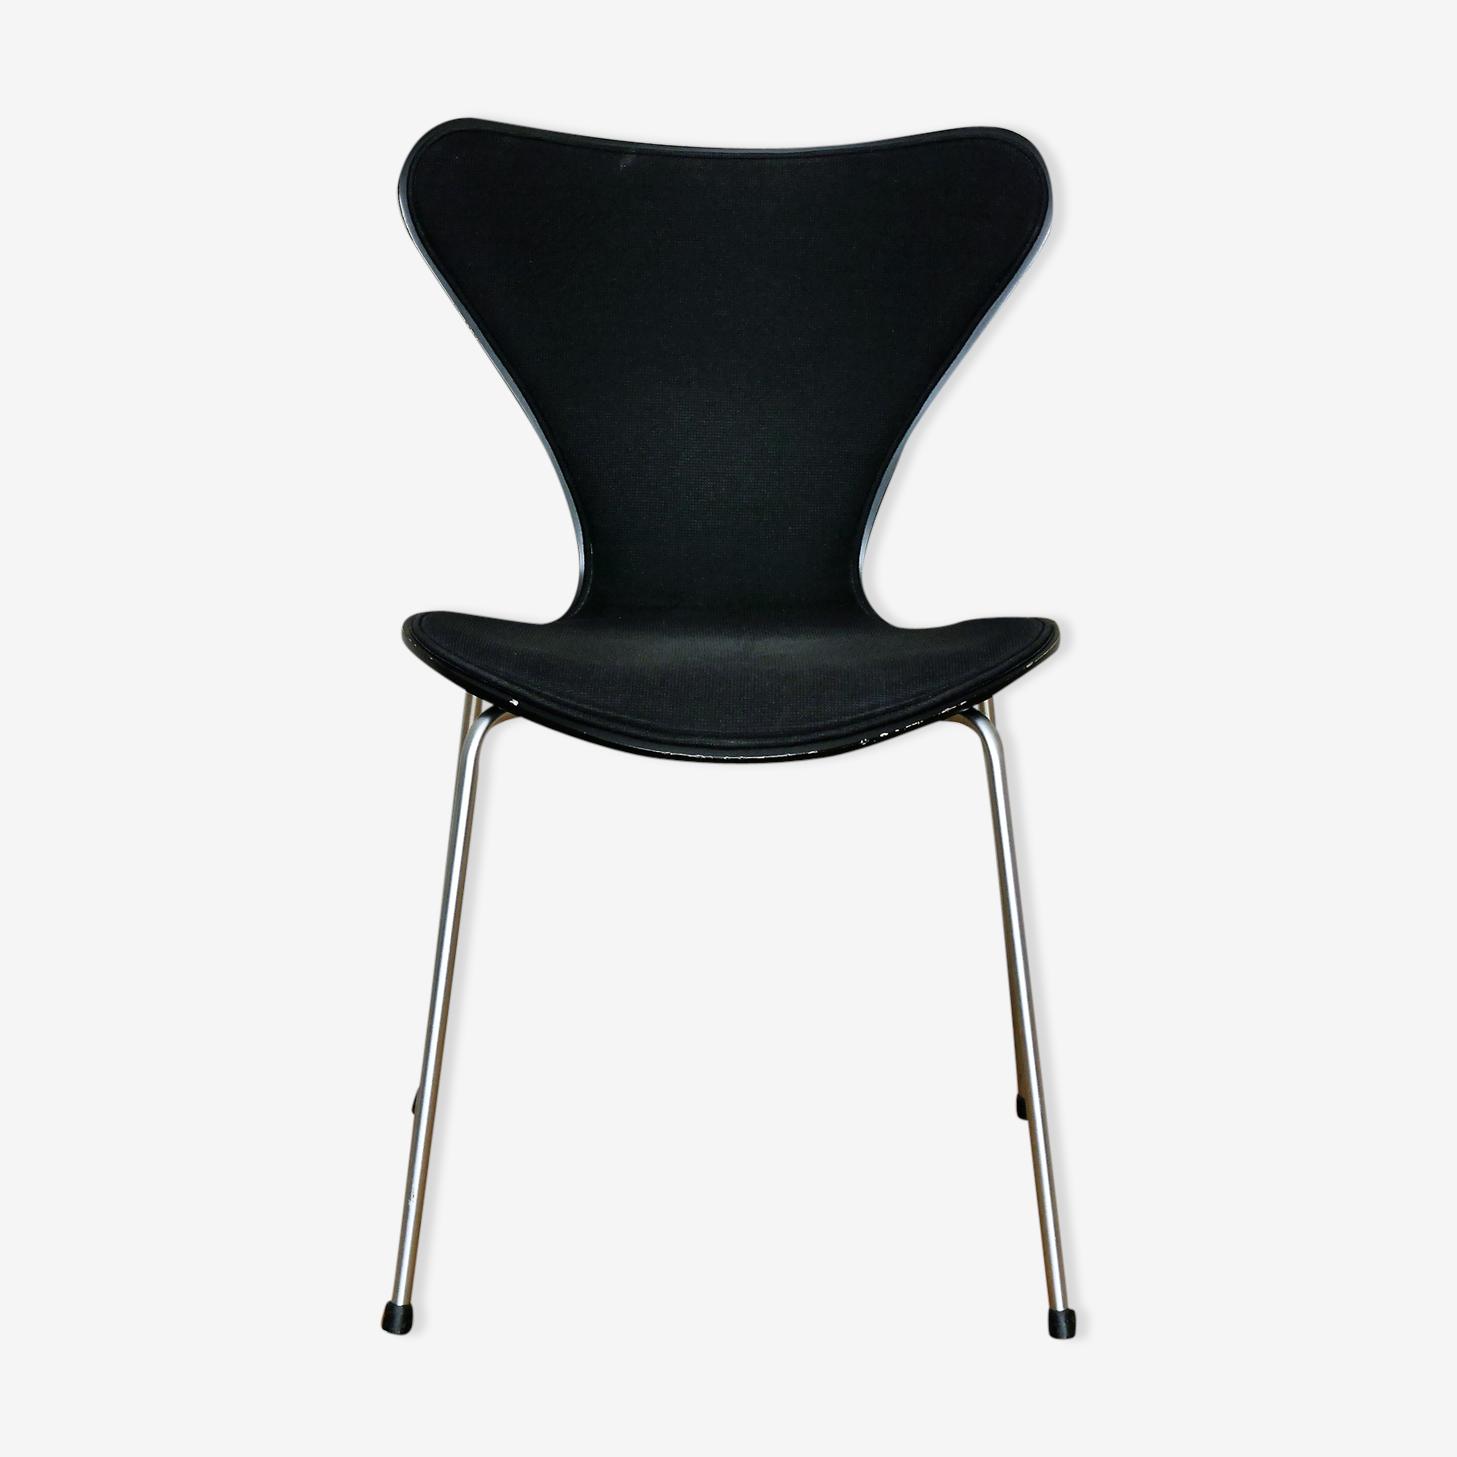 Chair 3107 by Jacobsen edition Fritz Hansen